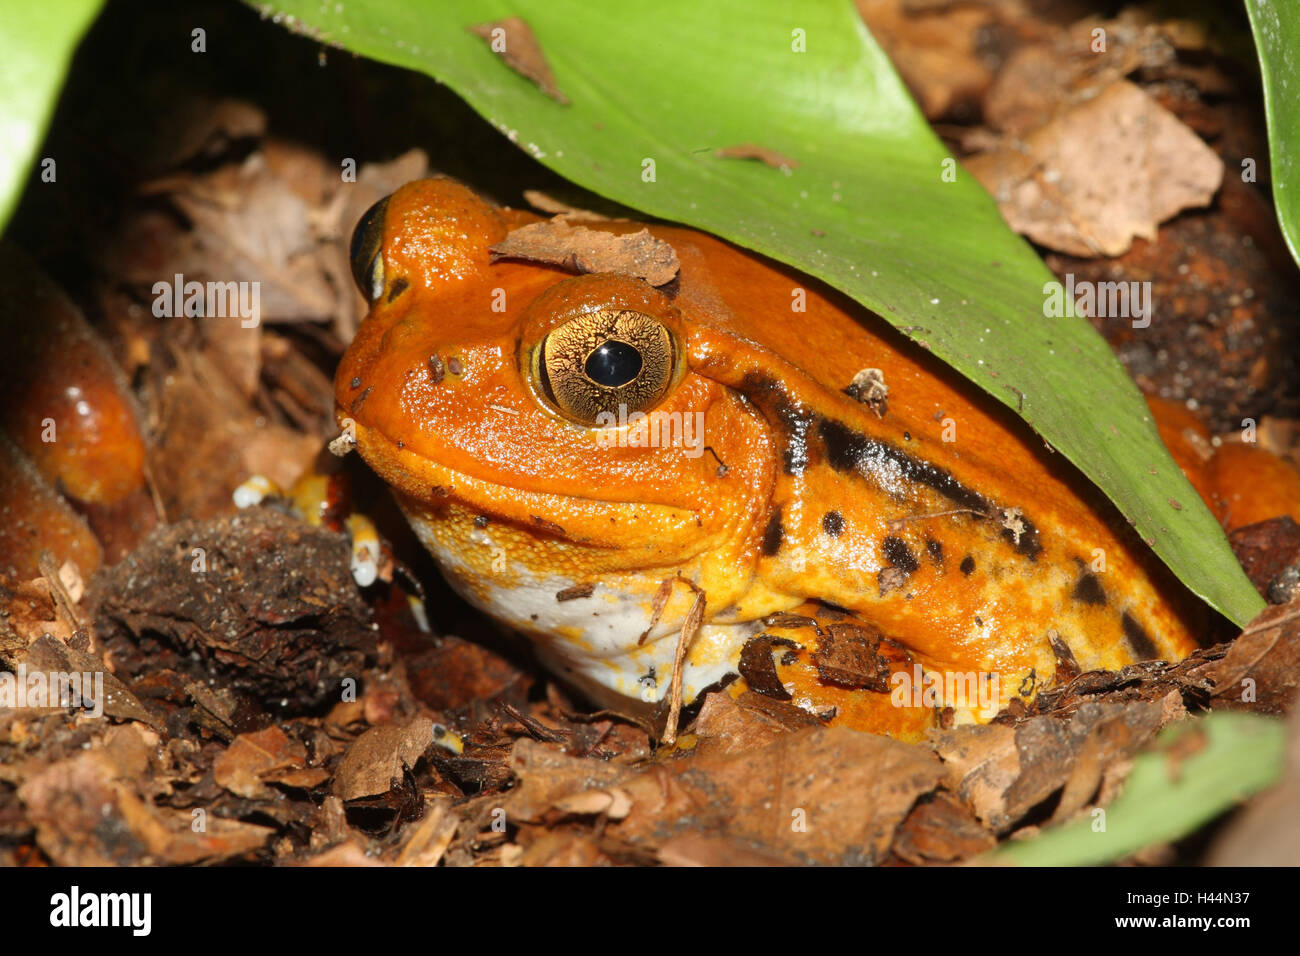 Southern tomato frog, Dyscophus guineti, - Stock Image